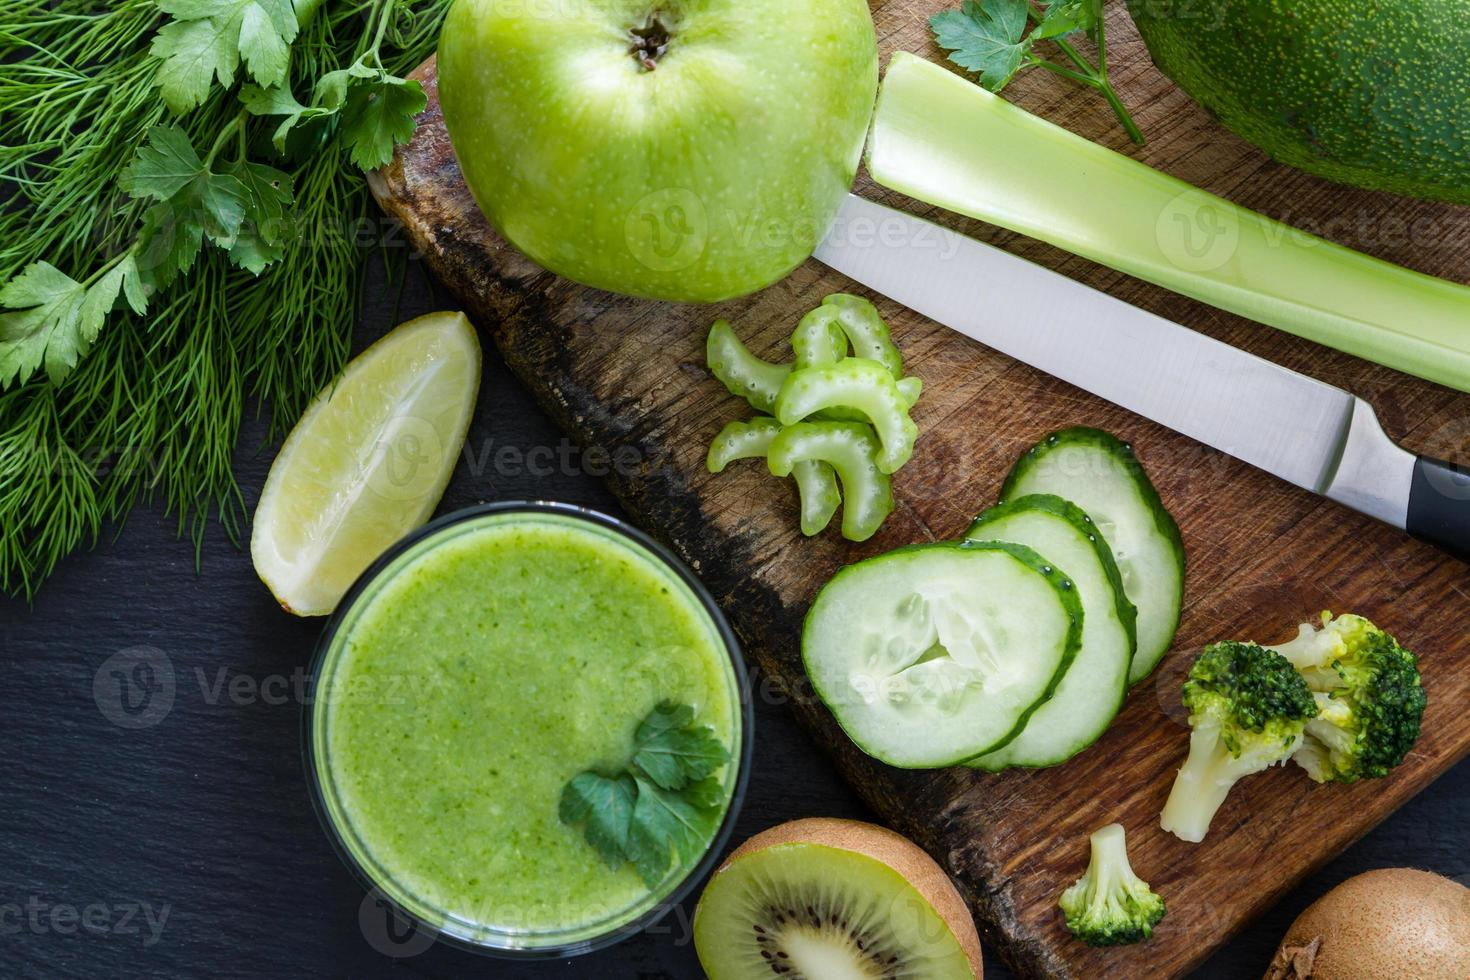 Green smoothie and ingredients - avocado, apple, cucumber, kiwi, lemon photo